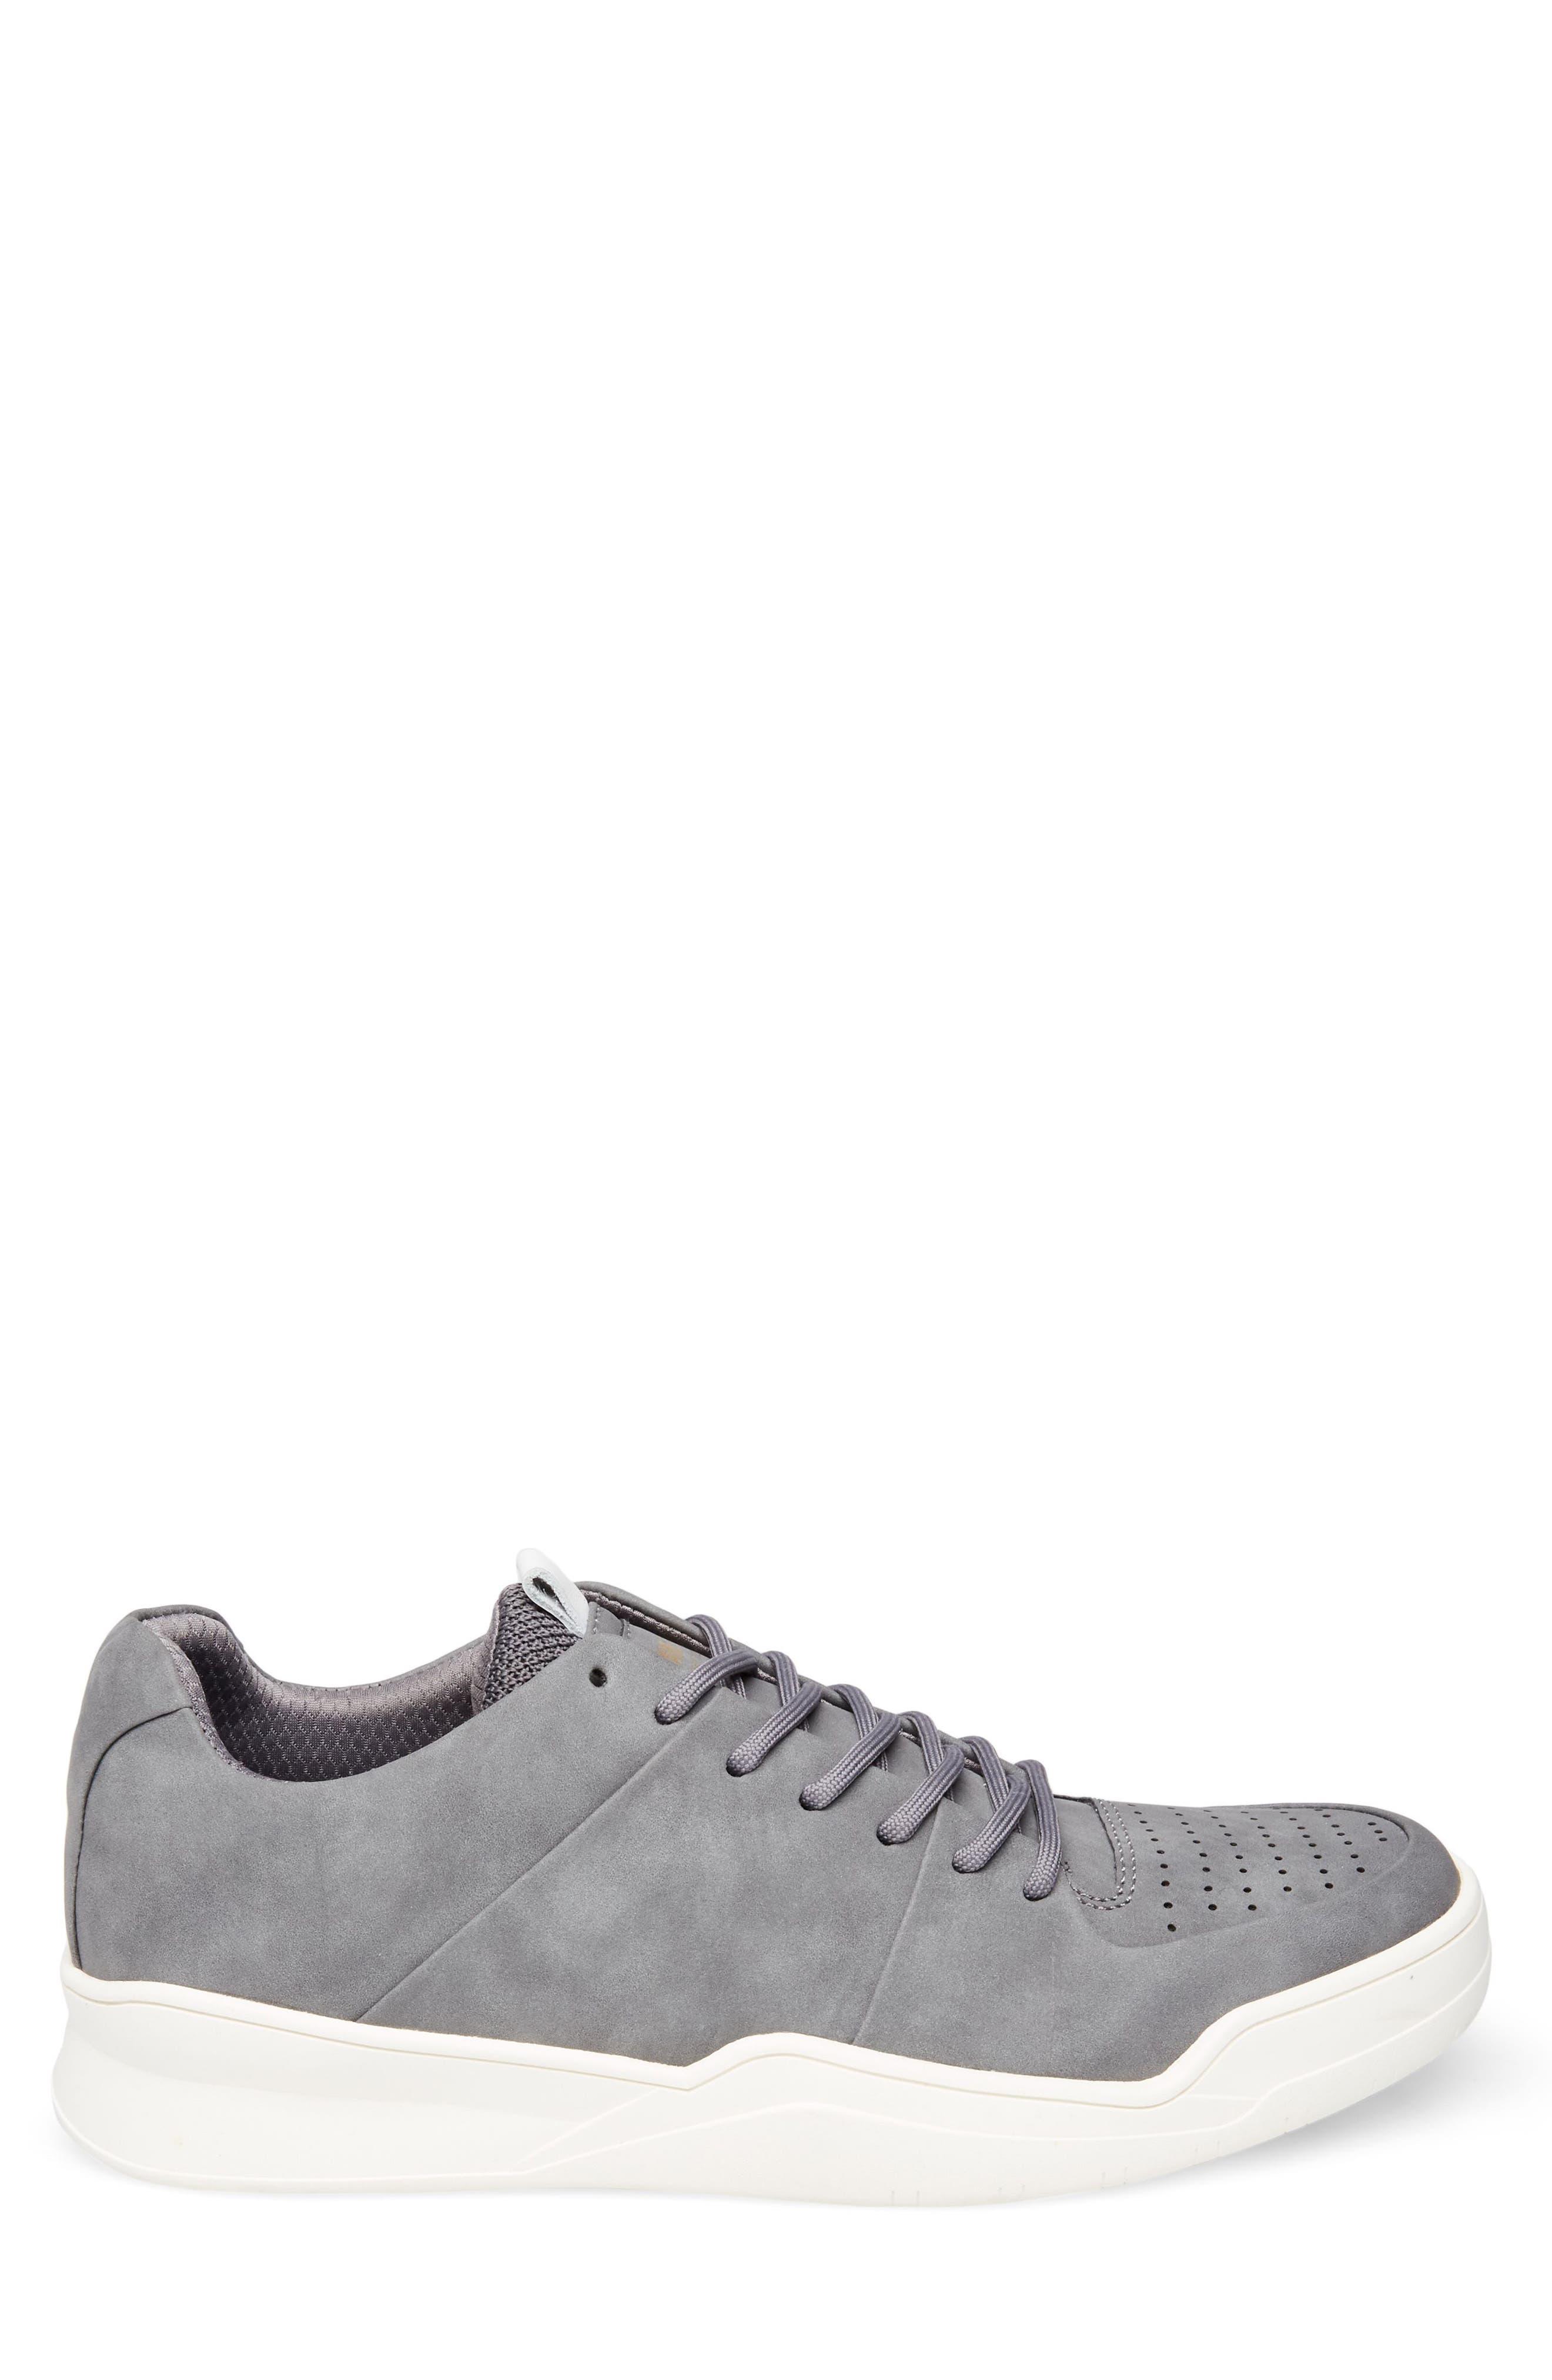 Vantage Sneaker,                             Alternate thumbnail 3, color,                             Grey